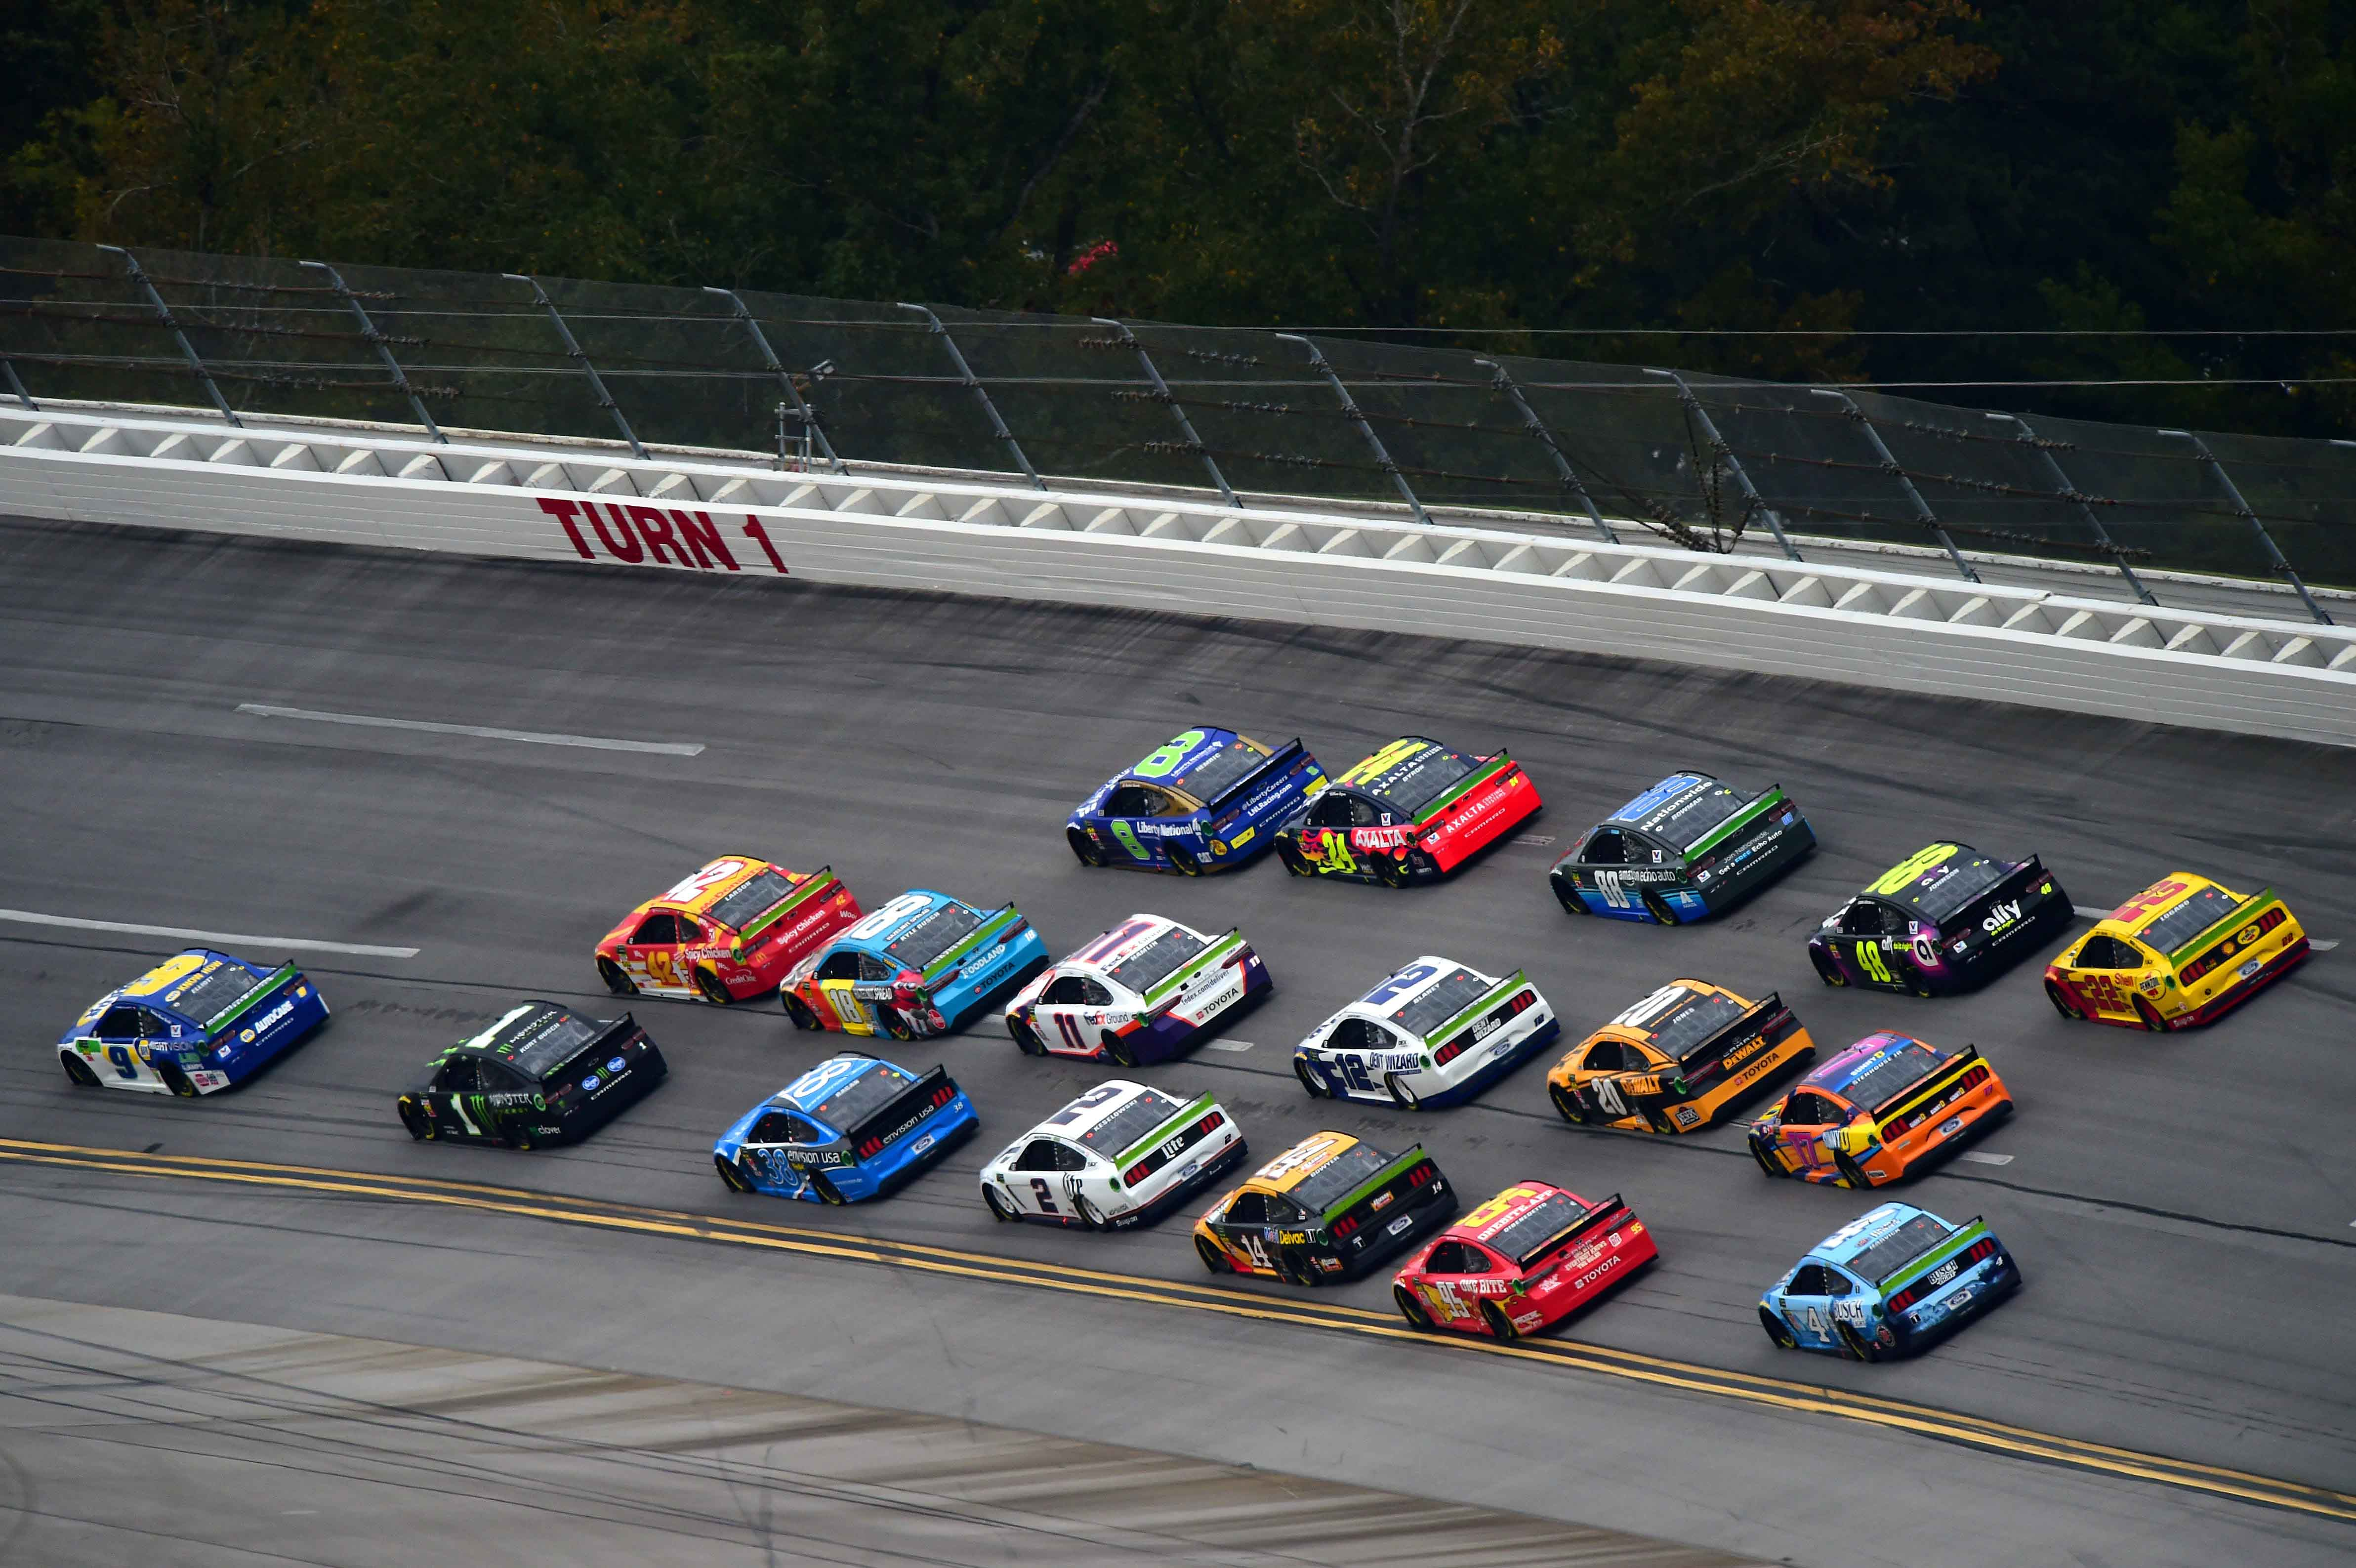 Talladega Race Results: October 14, 2019 (NASCAR Cup Series)